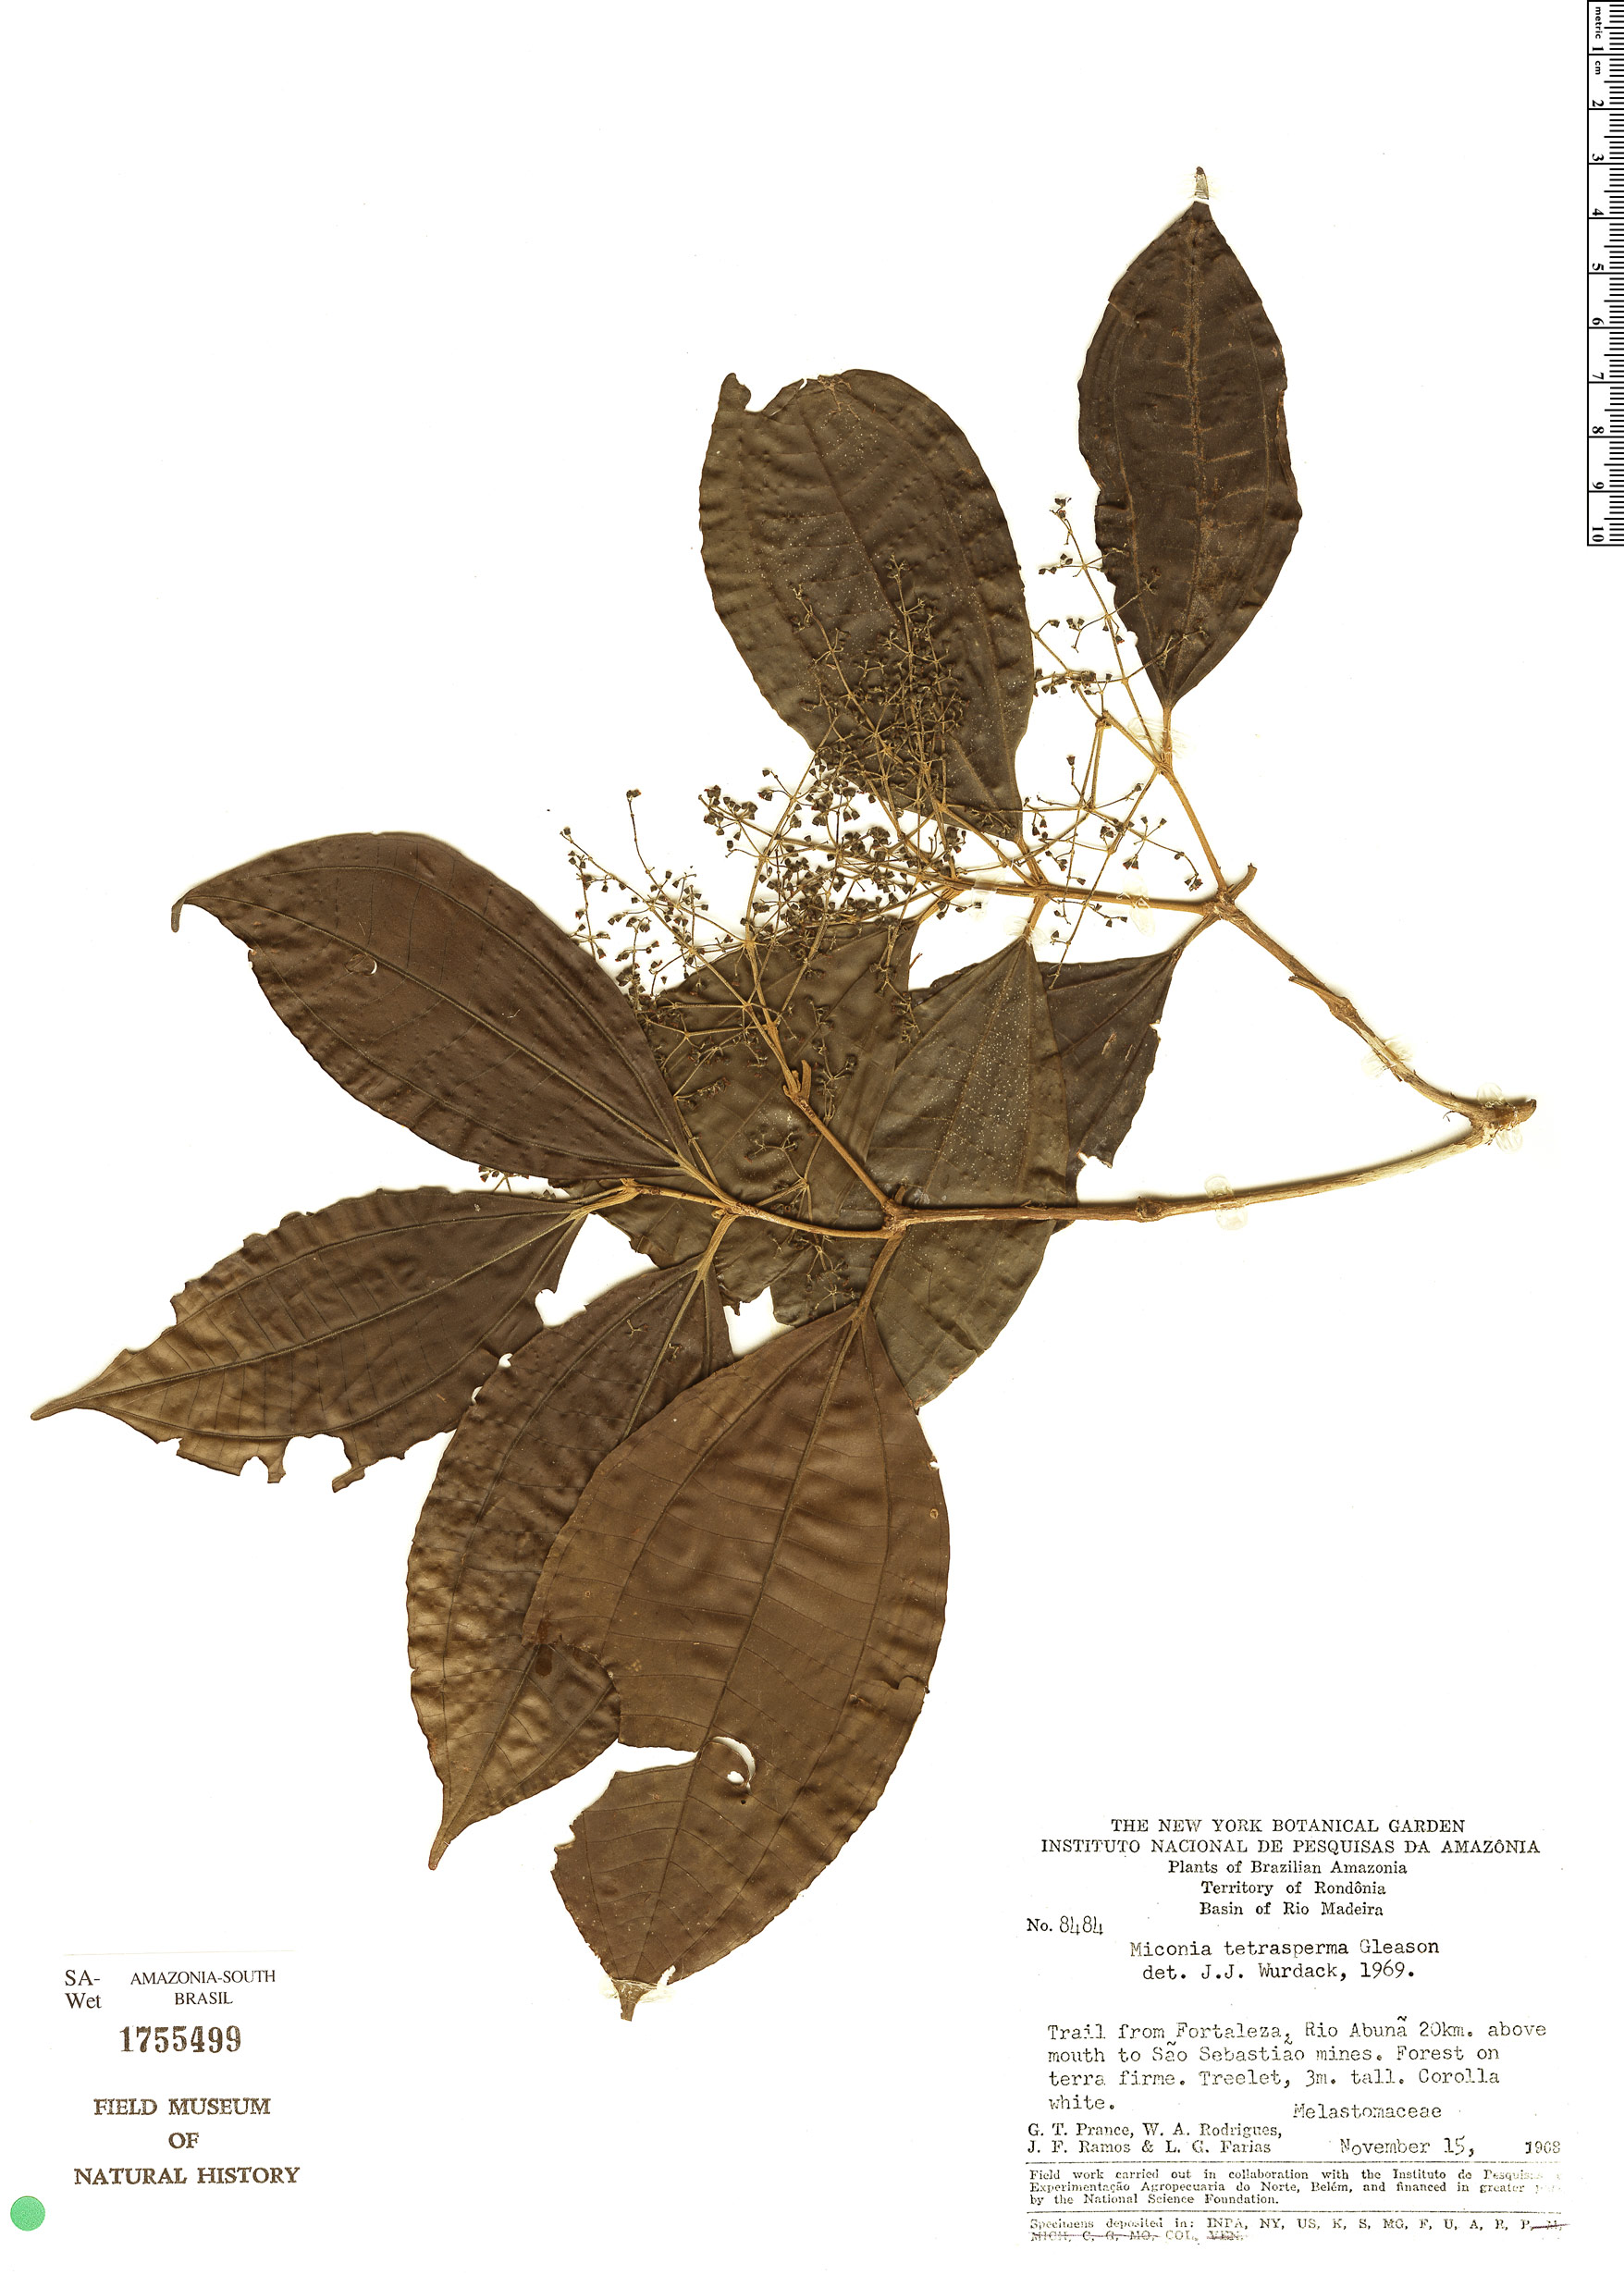 Specimen: Miconia tetrasperma